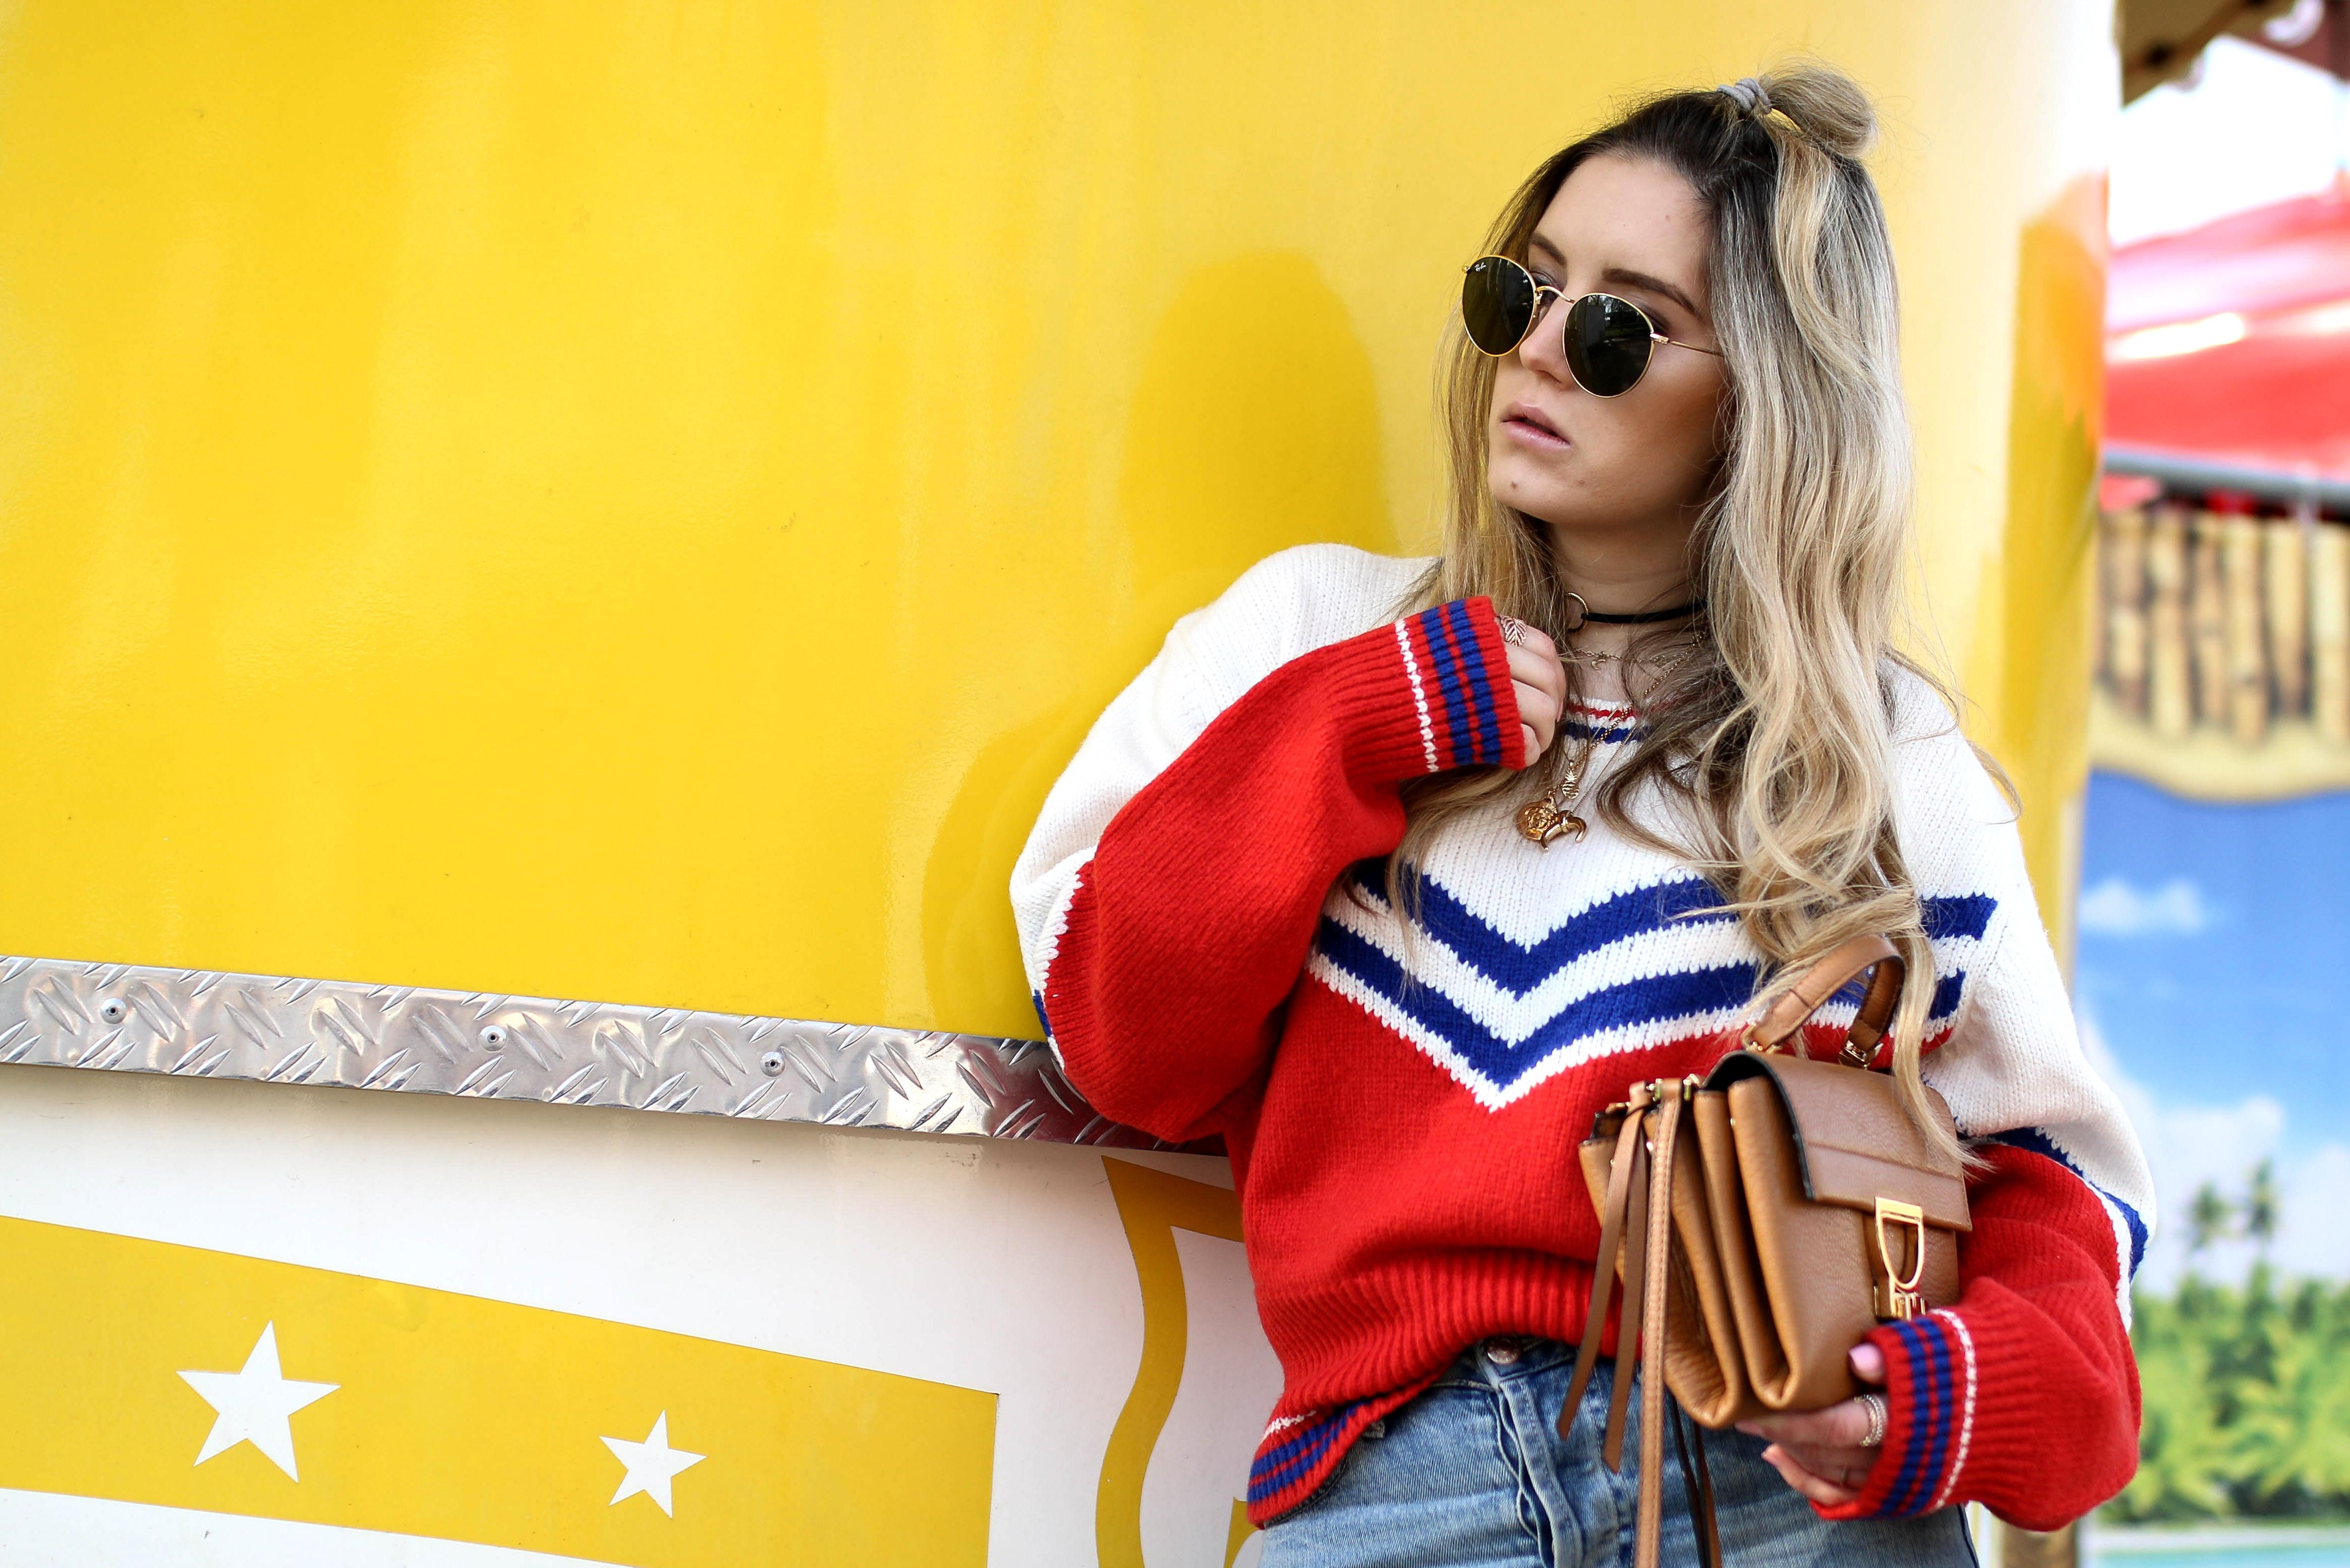 retro sweater retro jumper #storiesla fashion blog personal style blog coccinelle arlettis mini bag